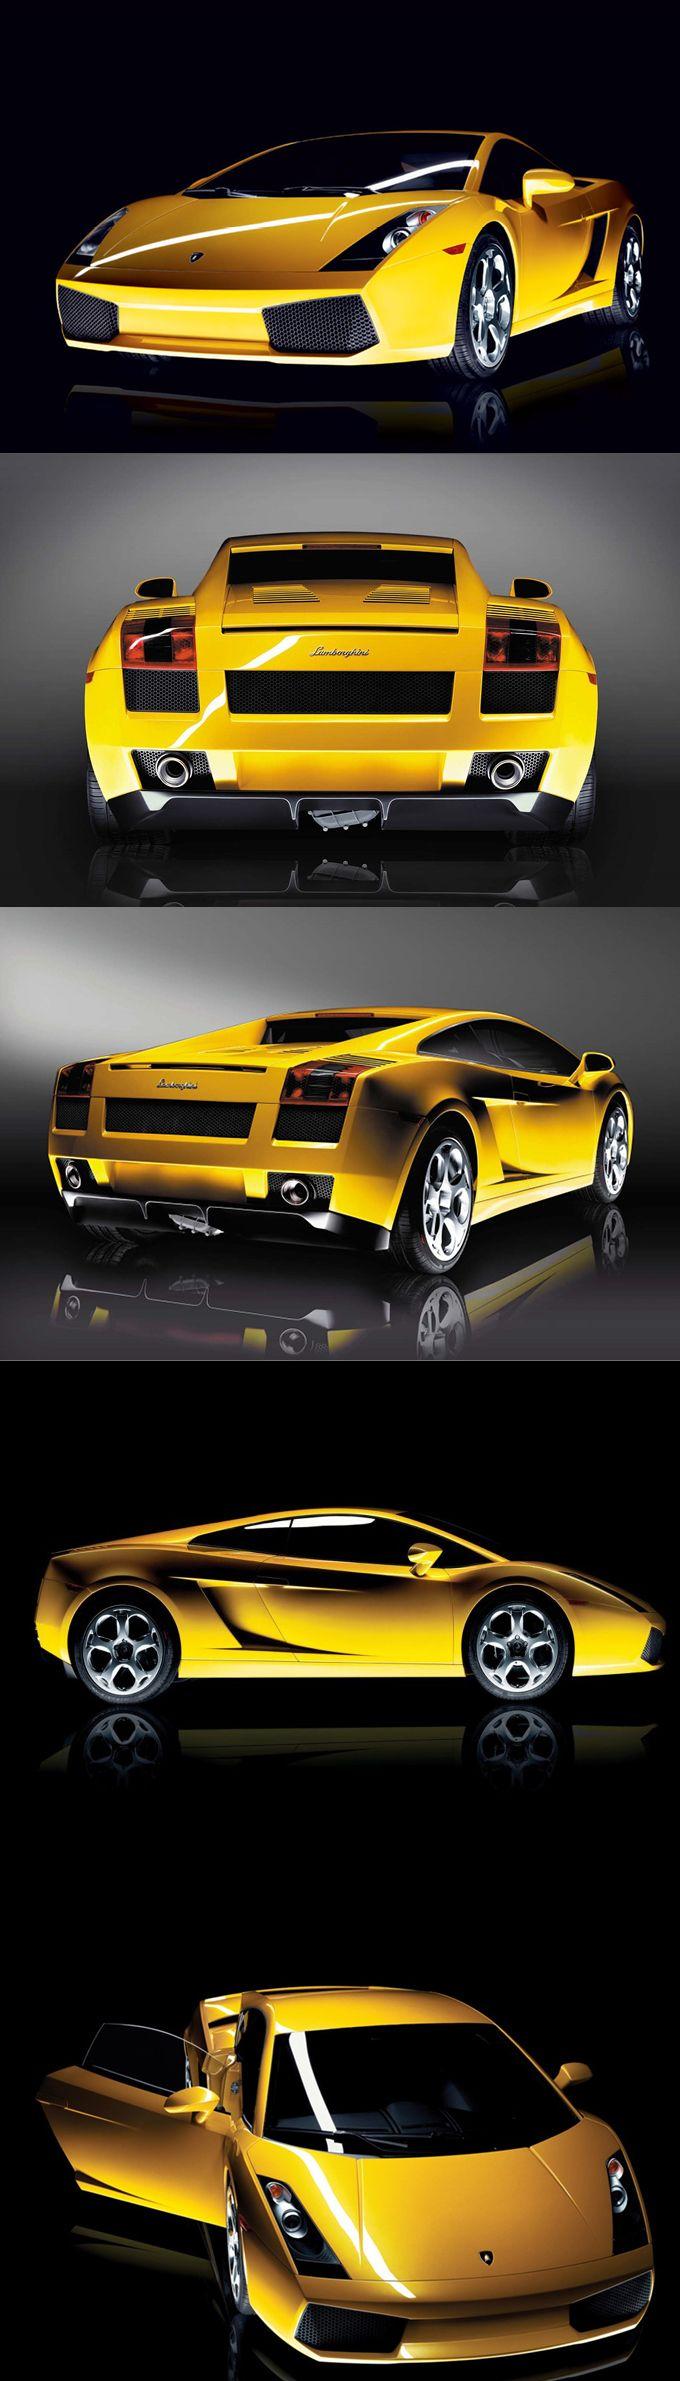 2006 Lamborghini Gallardo / Luc Donckerwolke / 513hp V10 / Italy / yellow